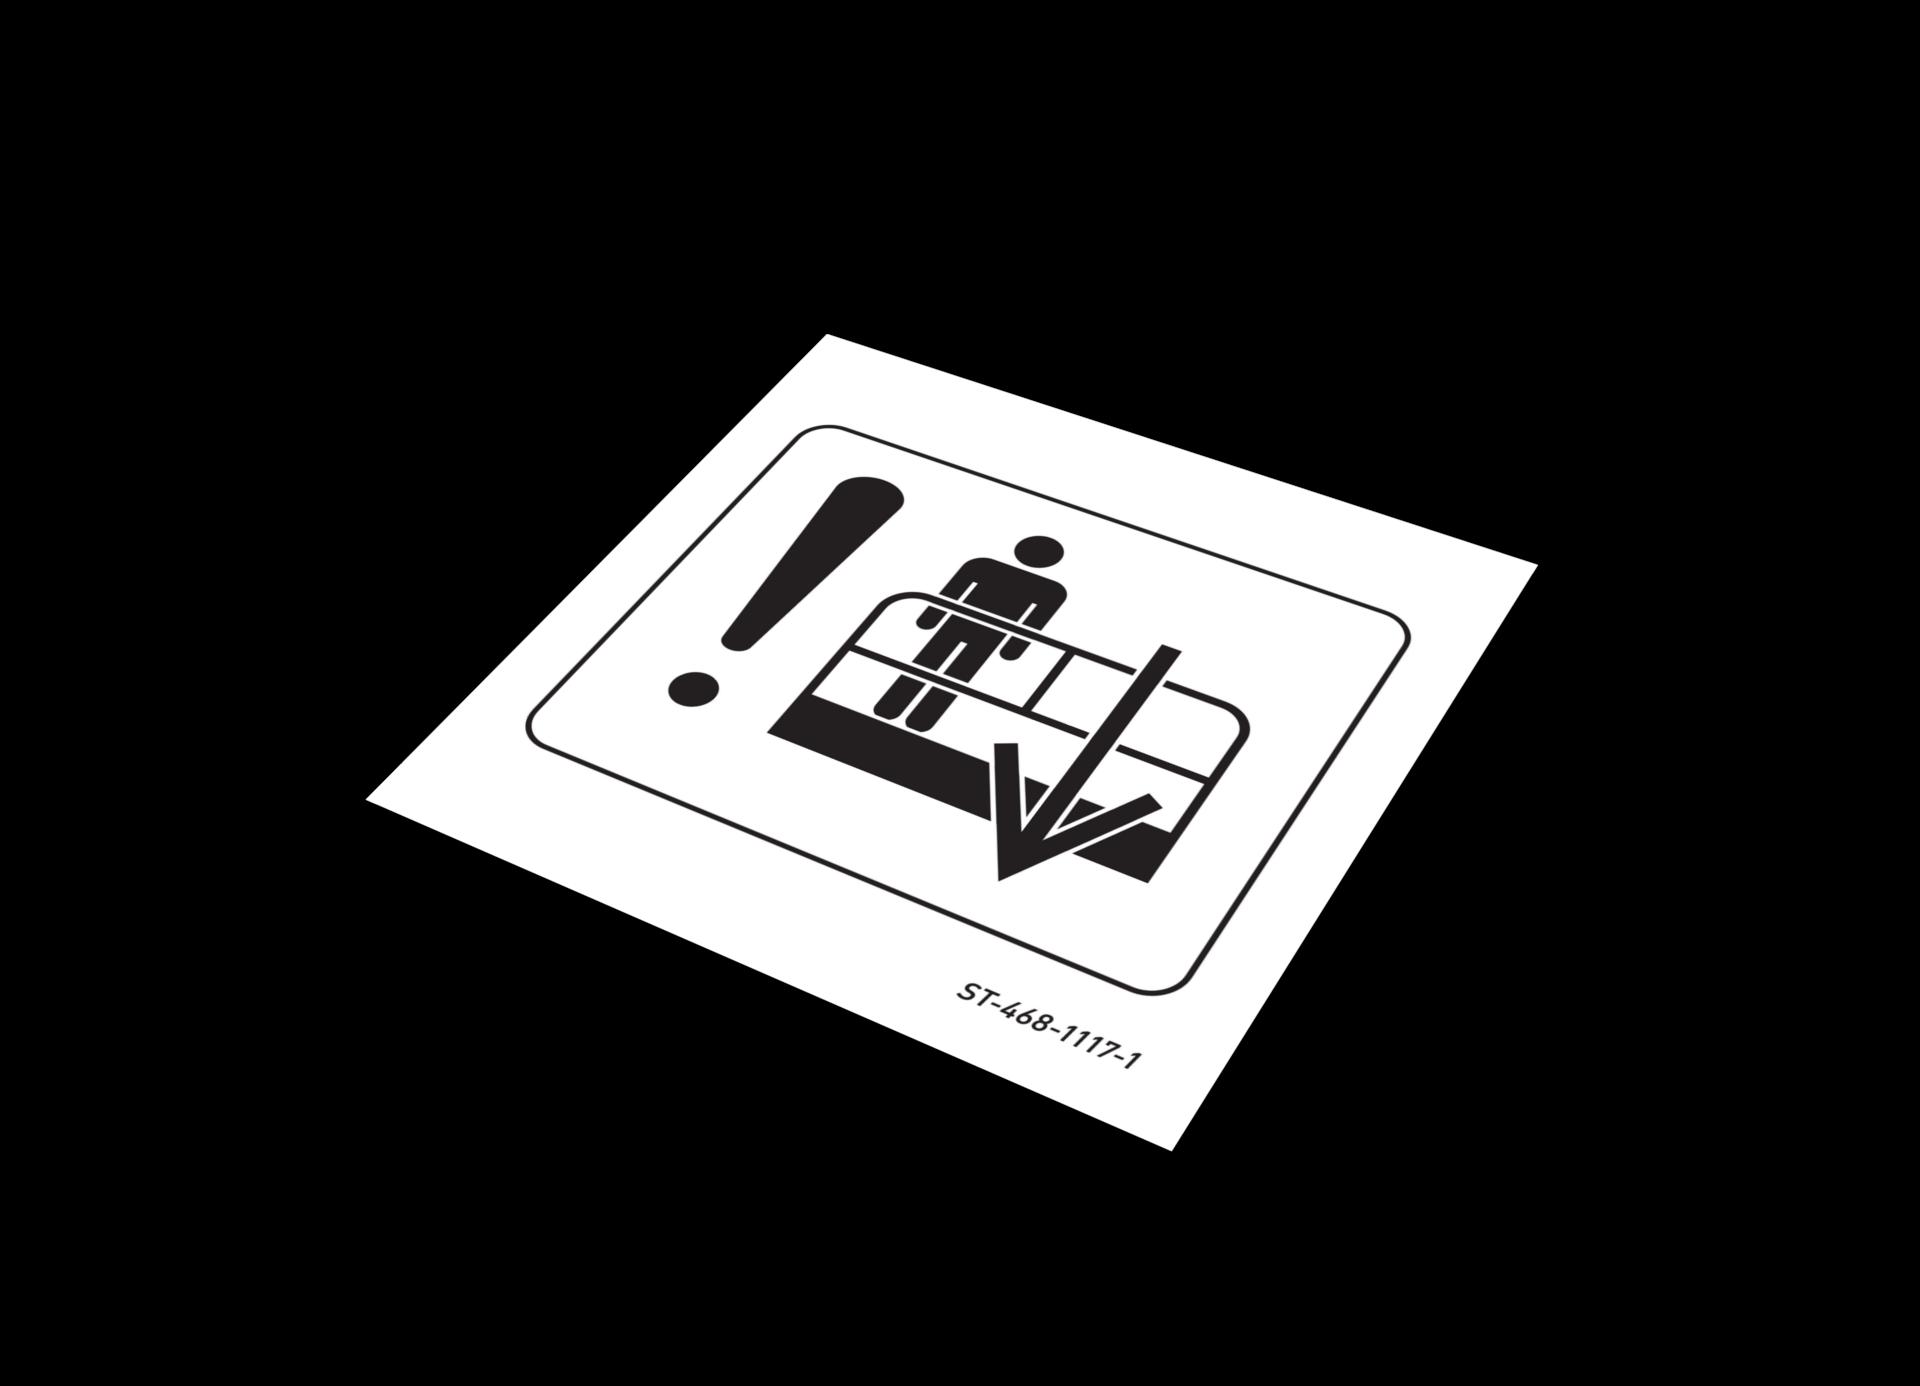 Sticker Notsenkung Sticker - Notsenkung